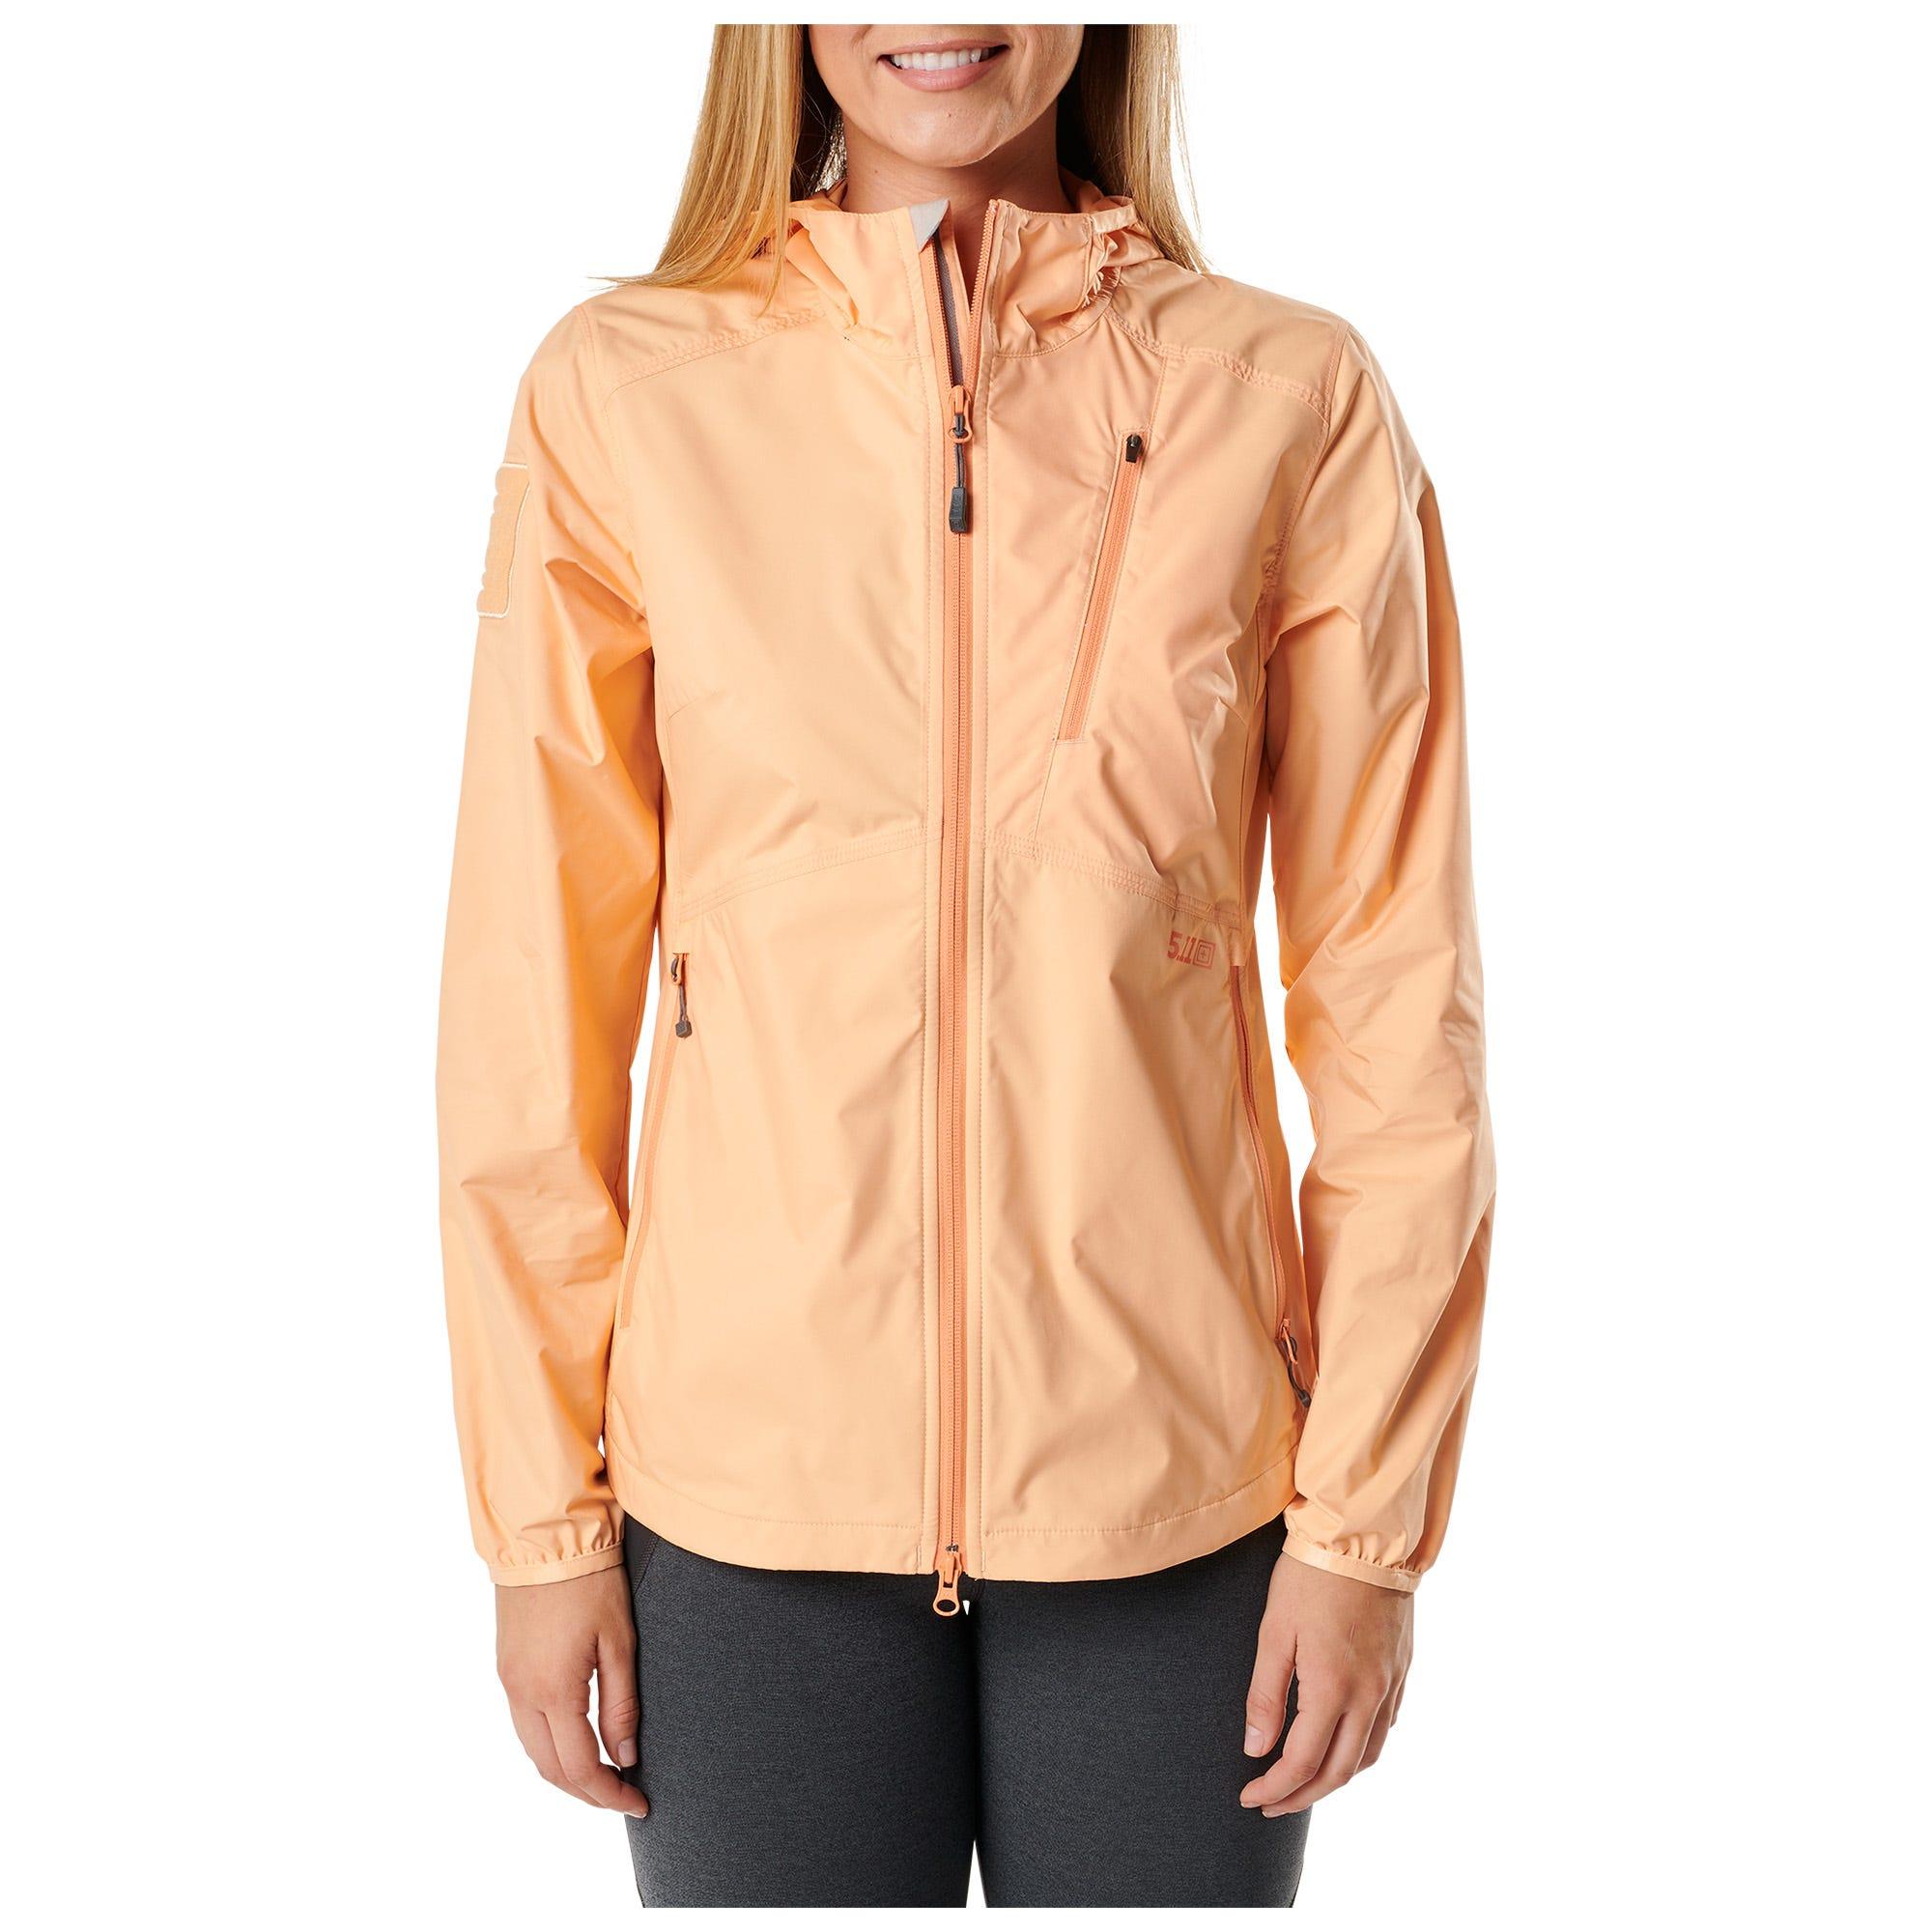 5.11 Tactical Women Women's Cascadia Windbreaker Packable Jacket (Grey) thumbnail